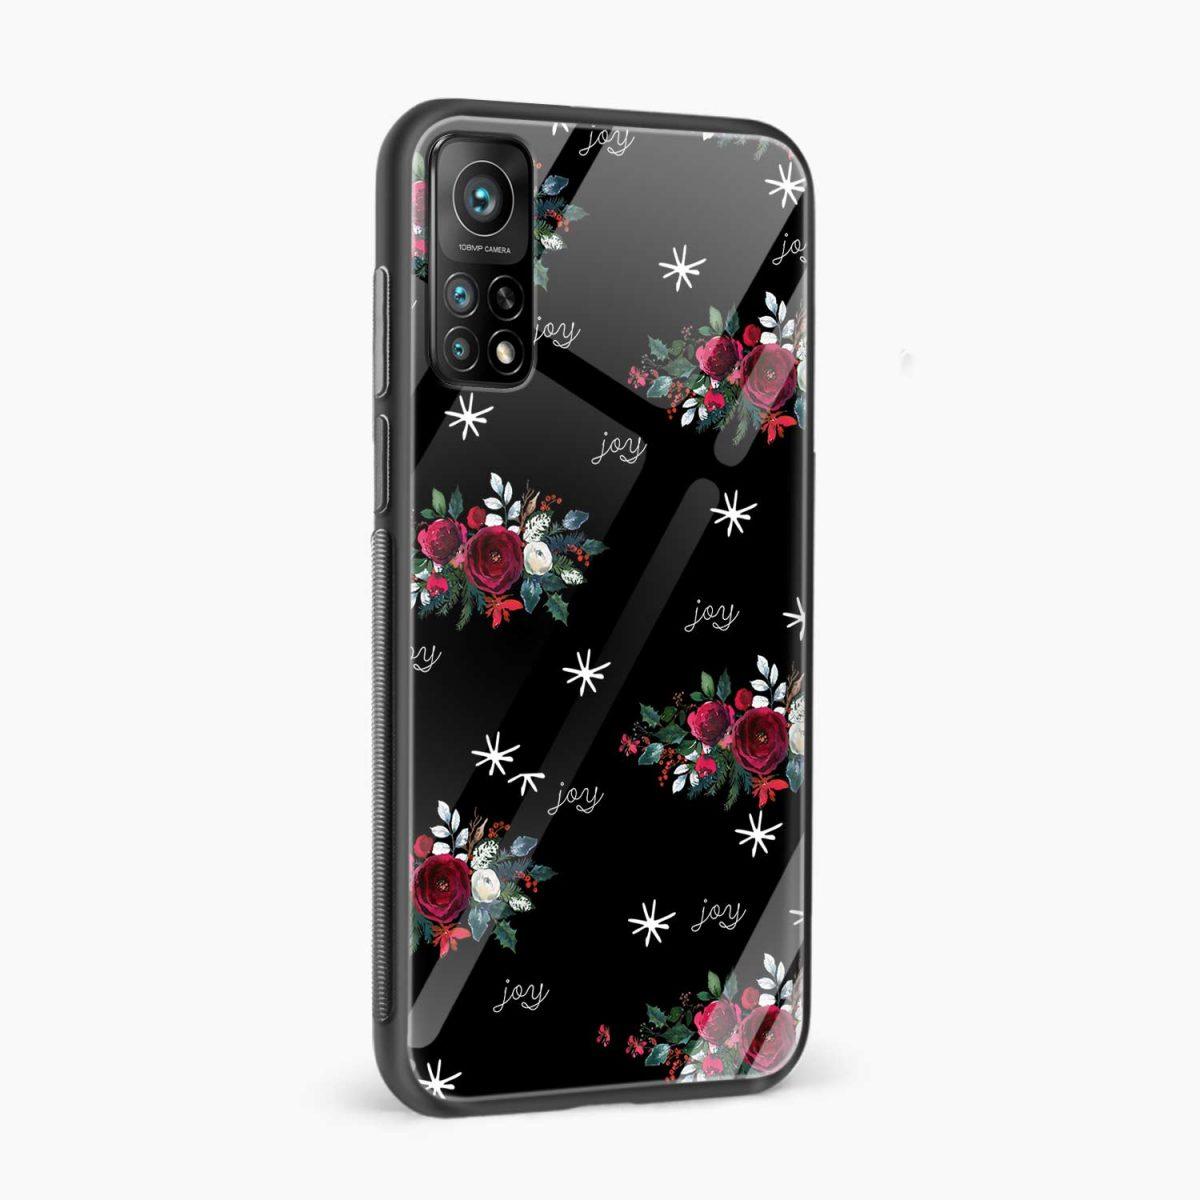 joy floral black colored xiaomi mi 10t pro back cover side view